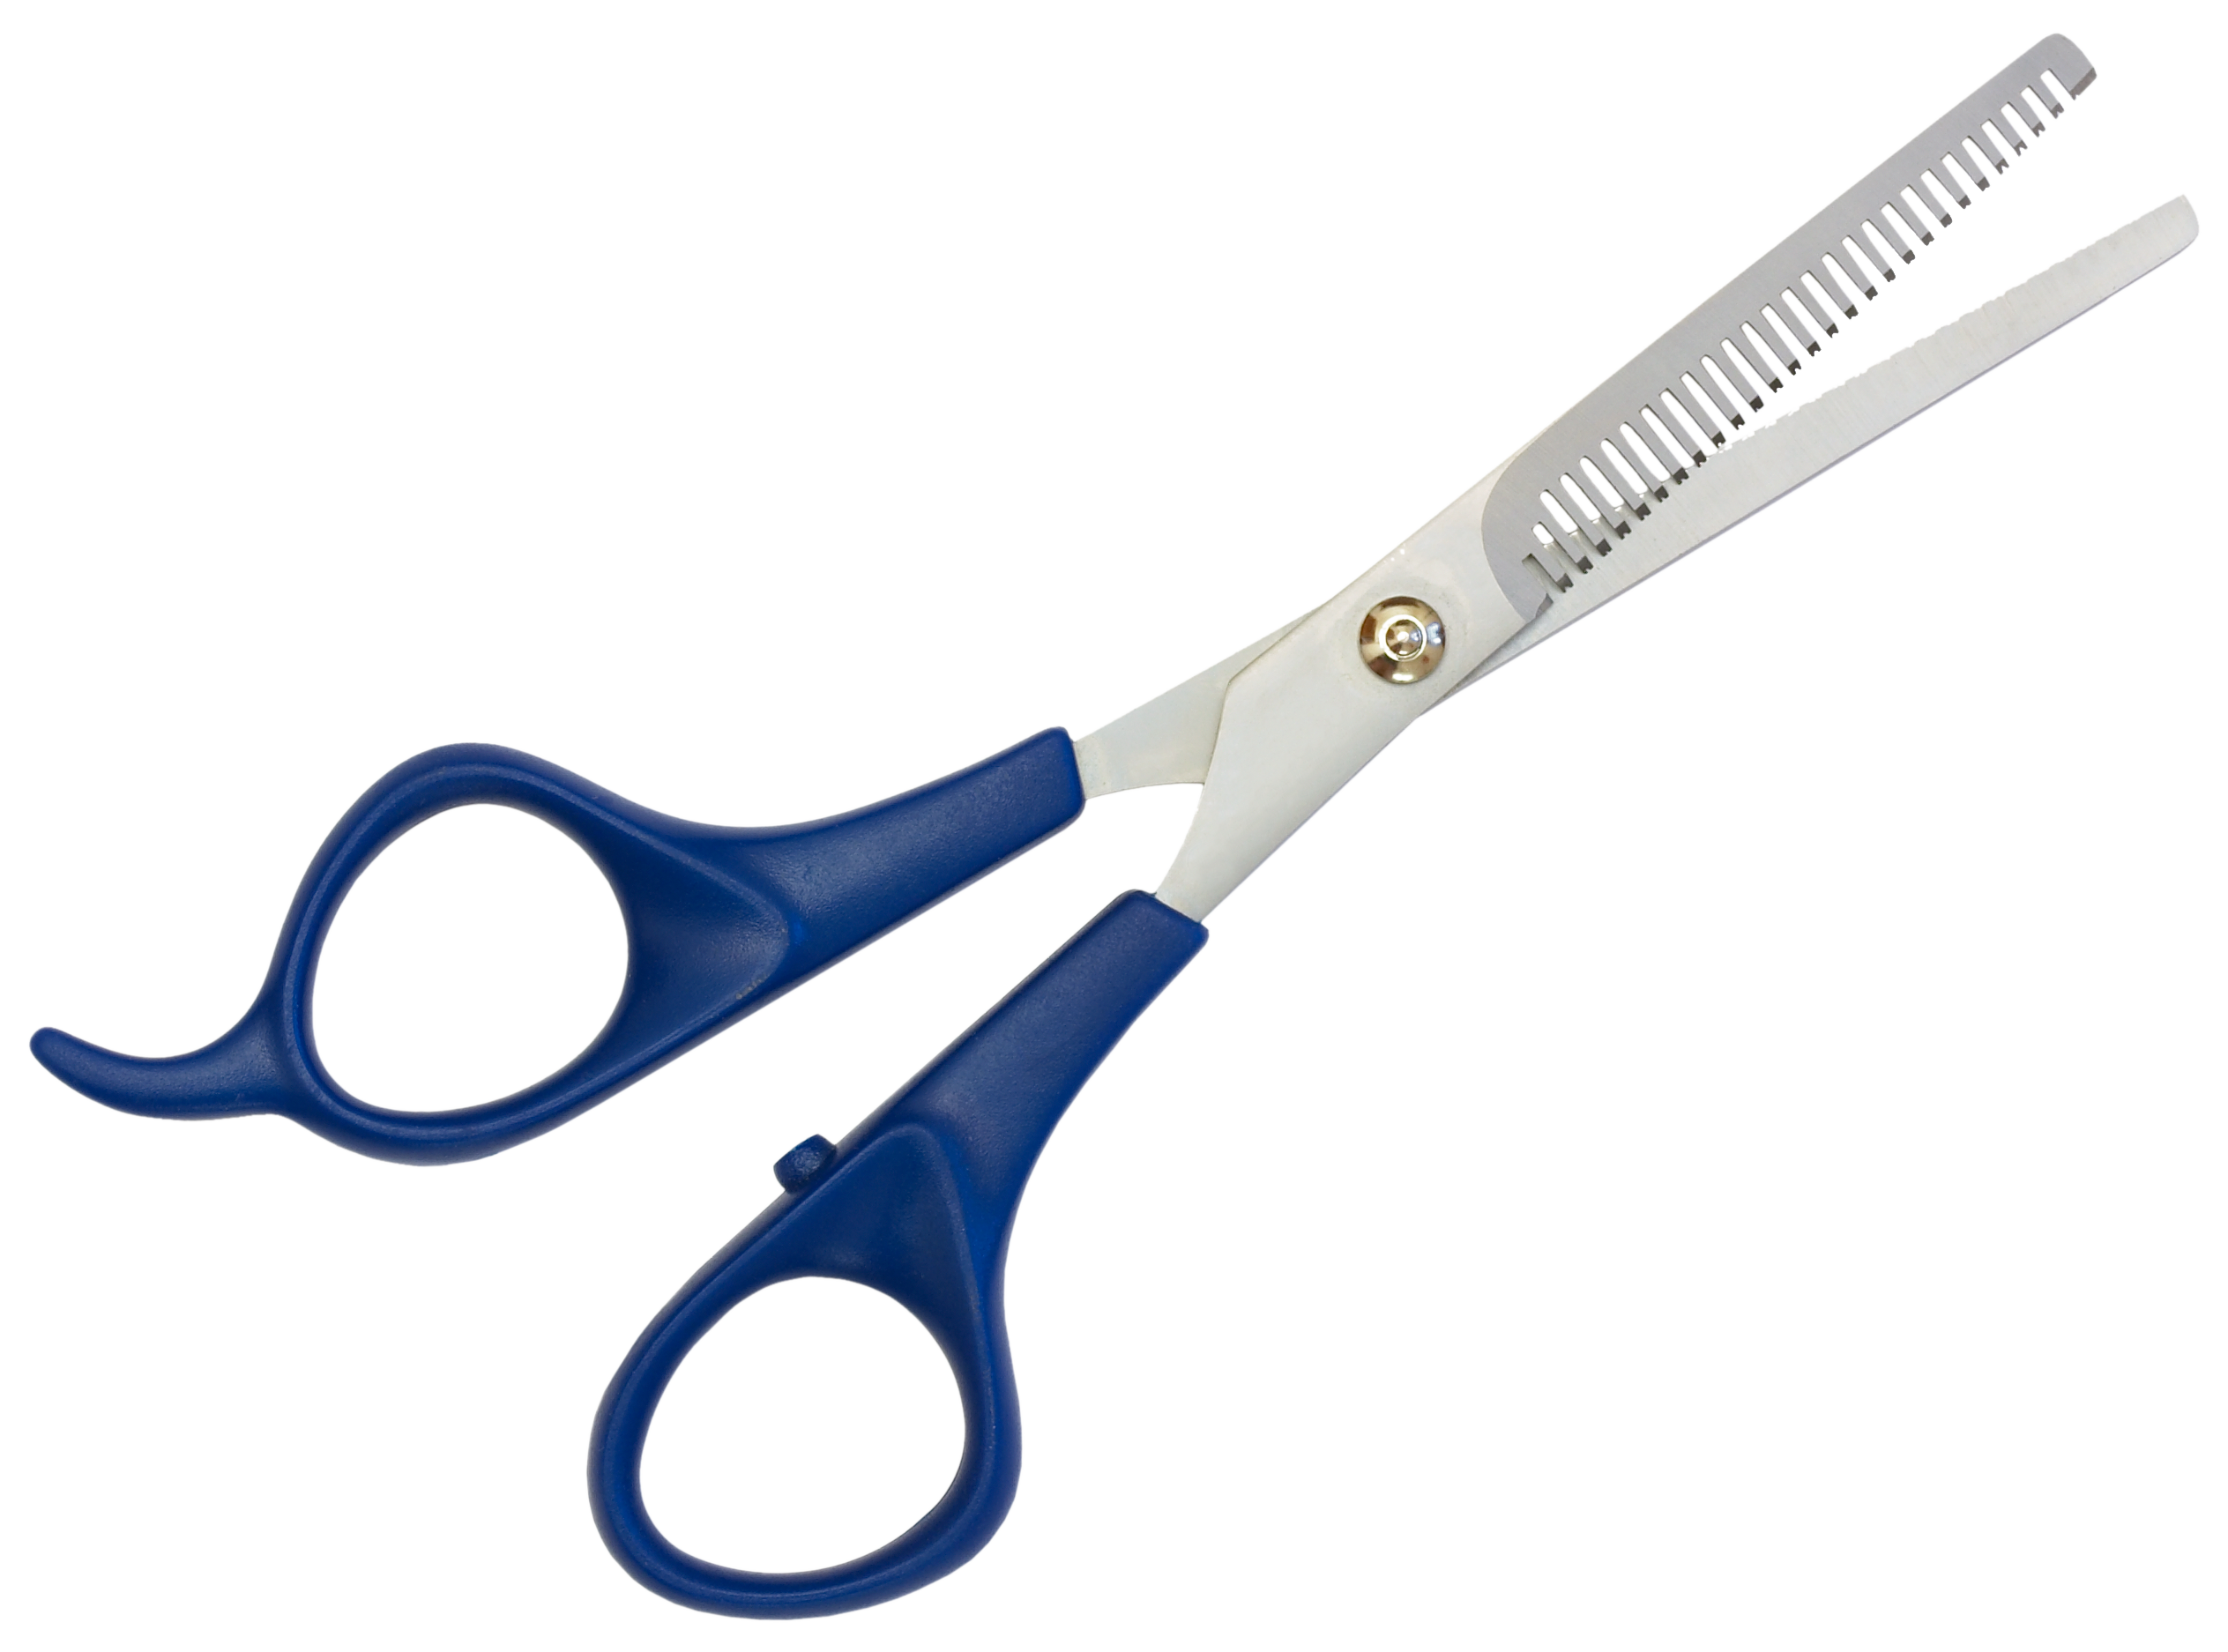 File:Thinning scissors.png - Scissors HD PNG